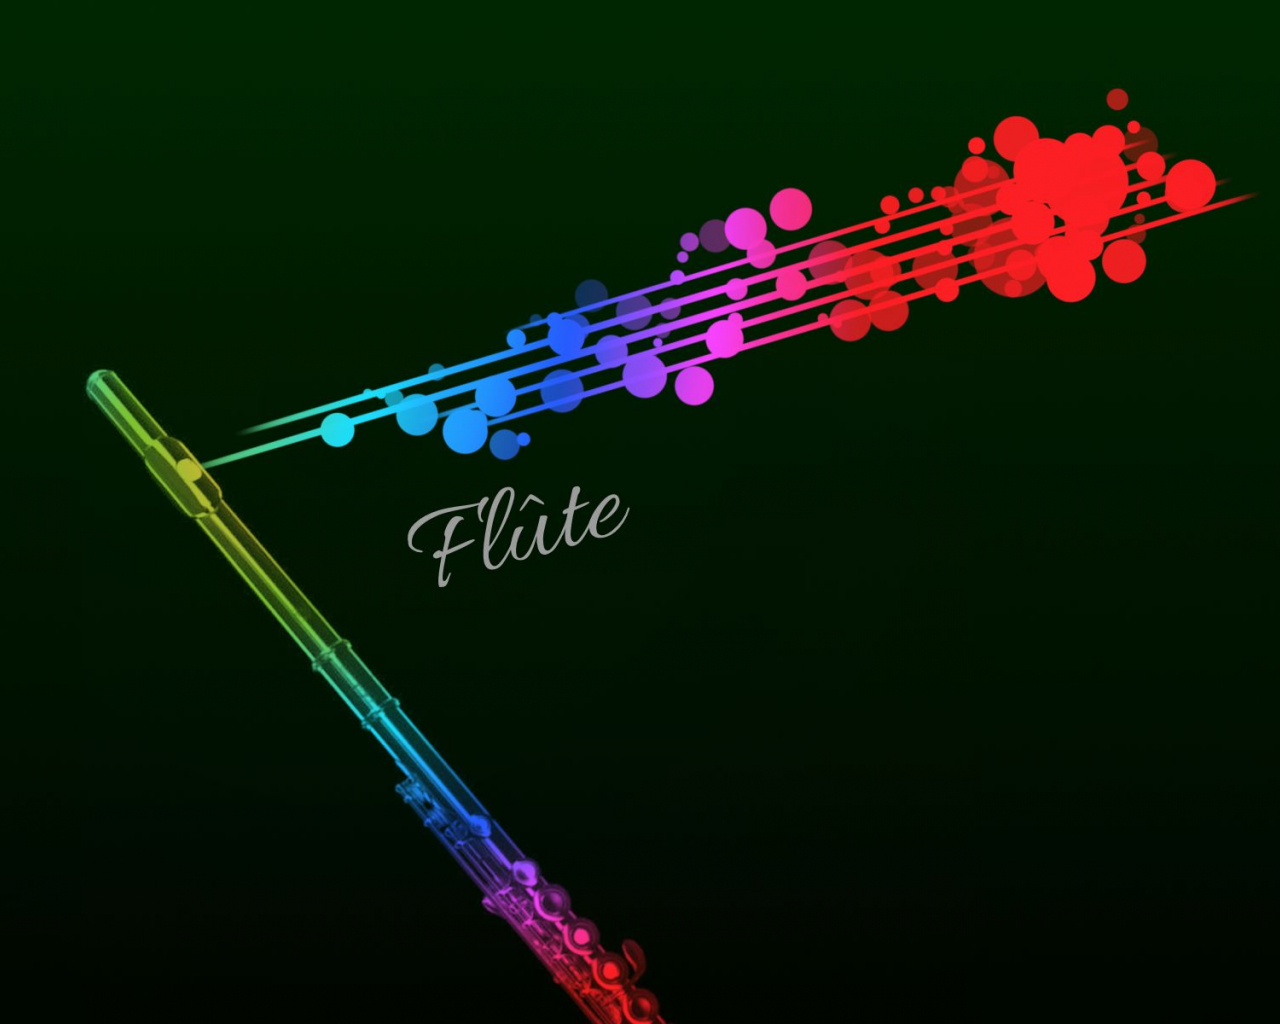 Free Download Rainbow Flute Wallpaper P In 2019 Band Nerd